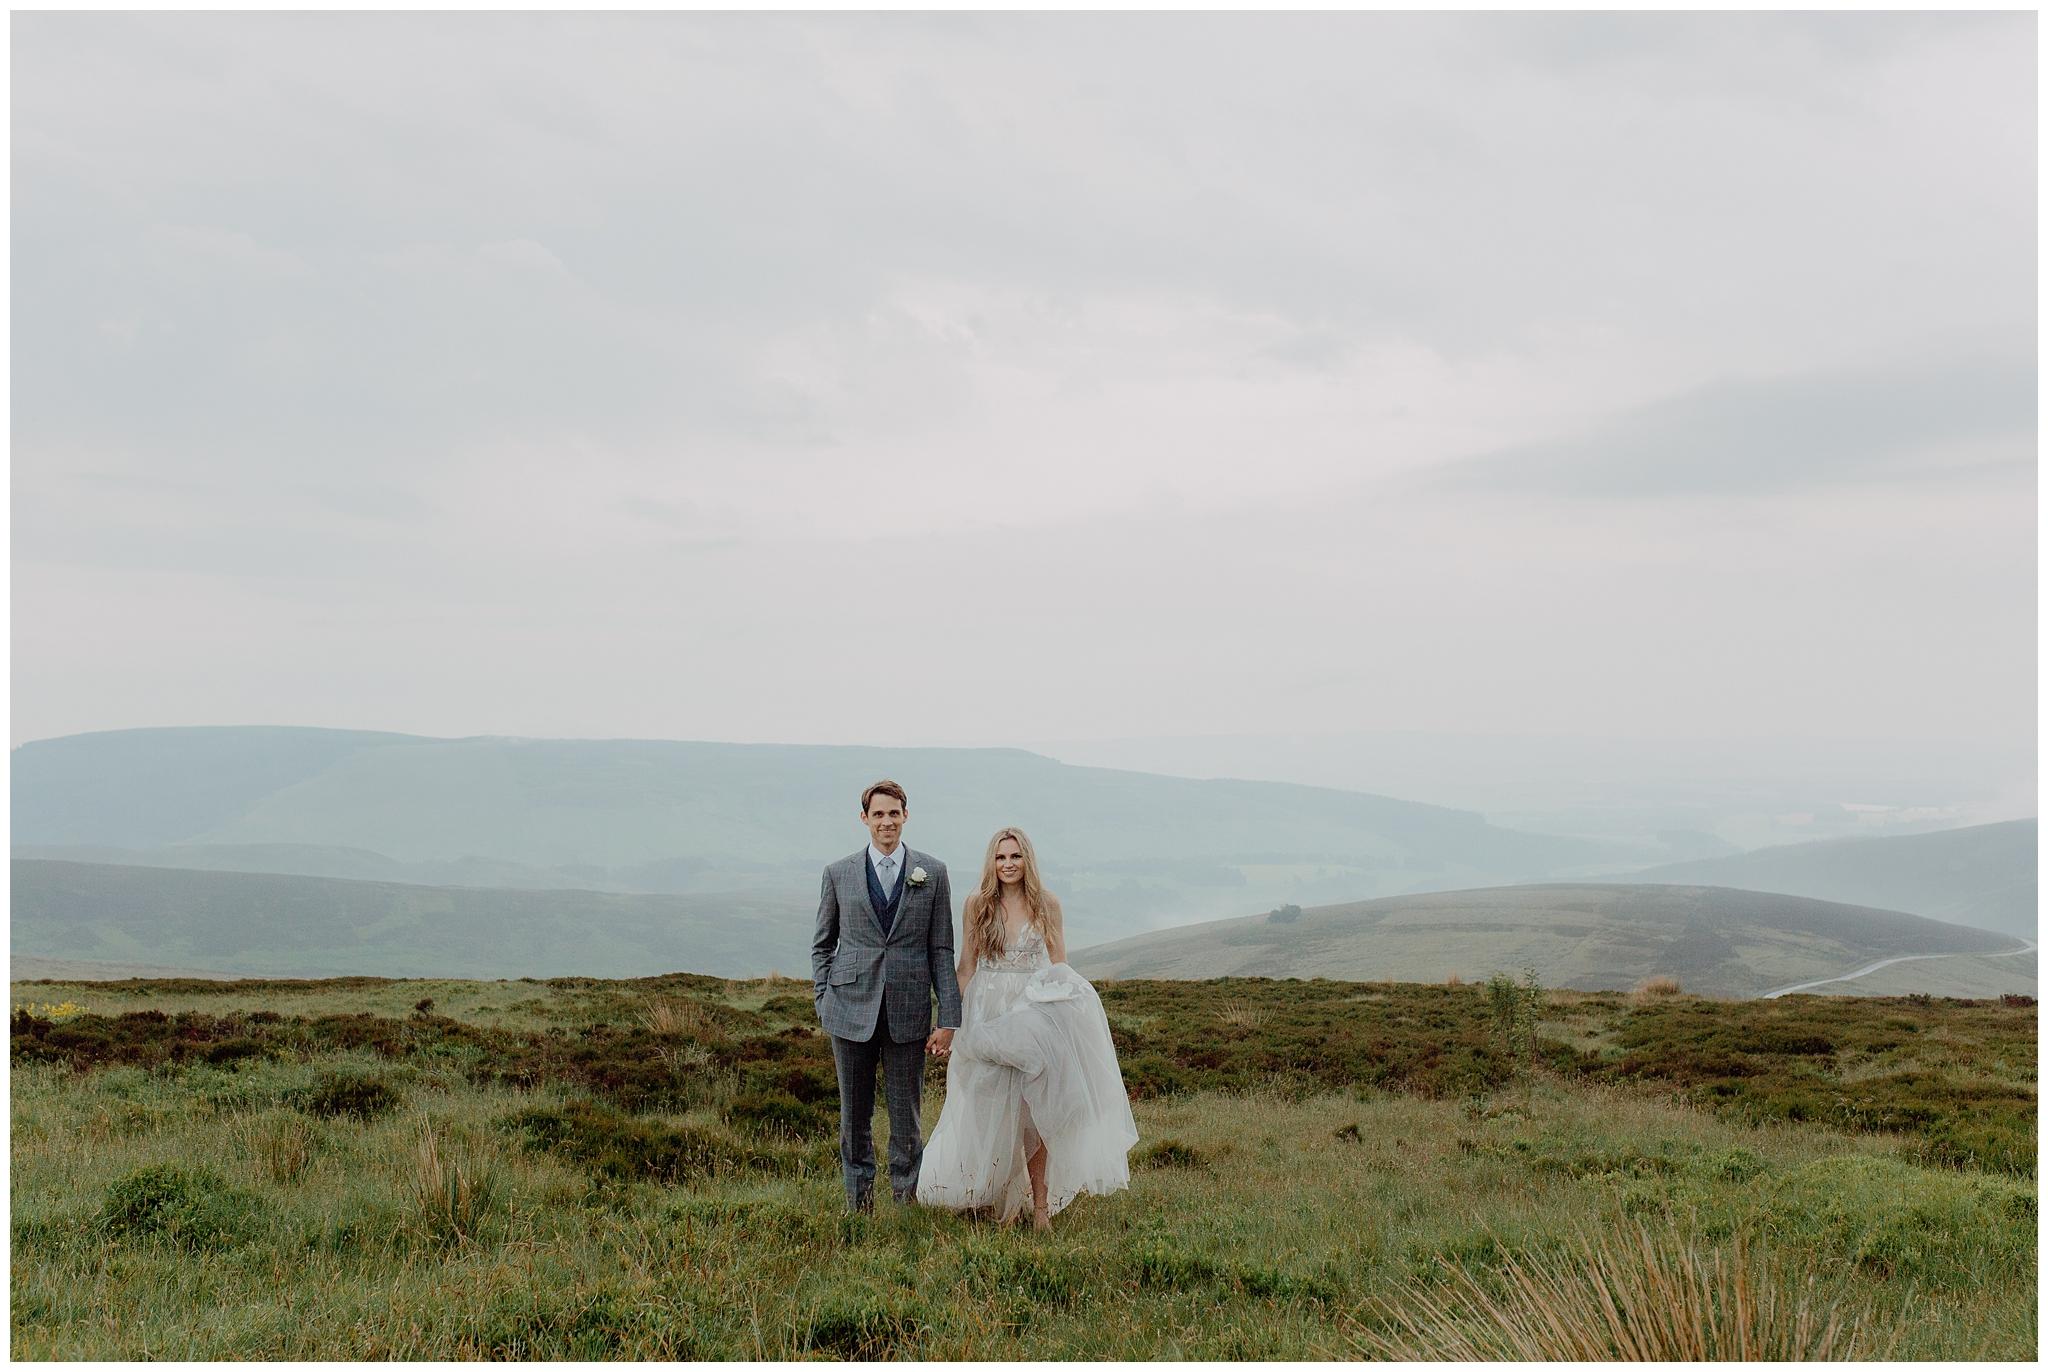 austin-texas-scottish-wedding-bride-groom22009.JPG